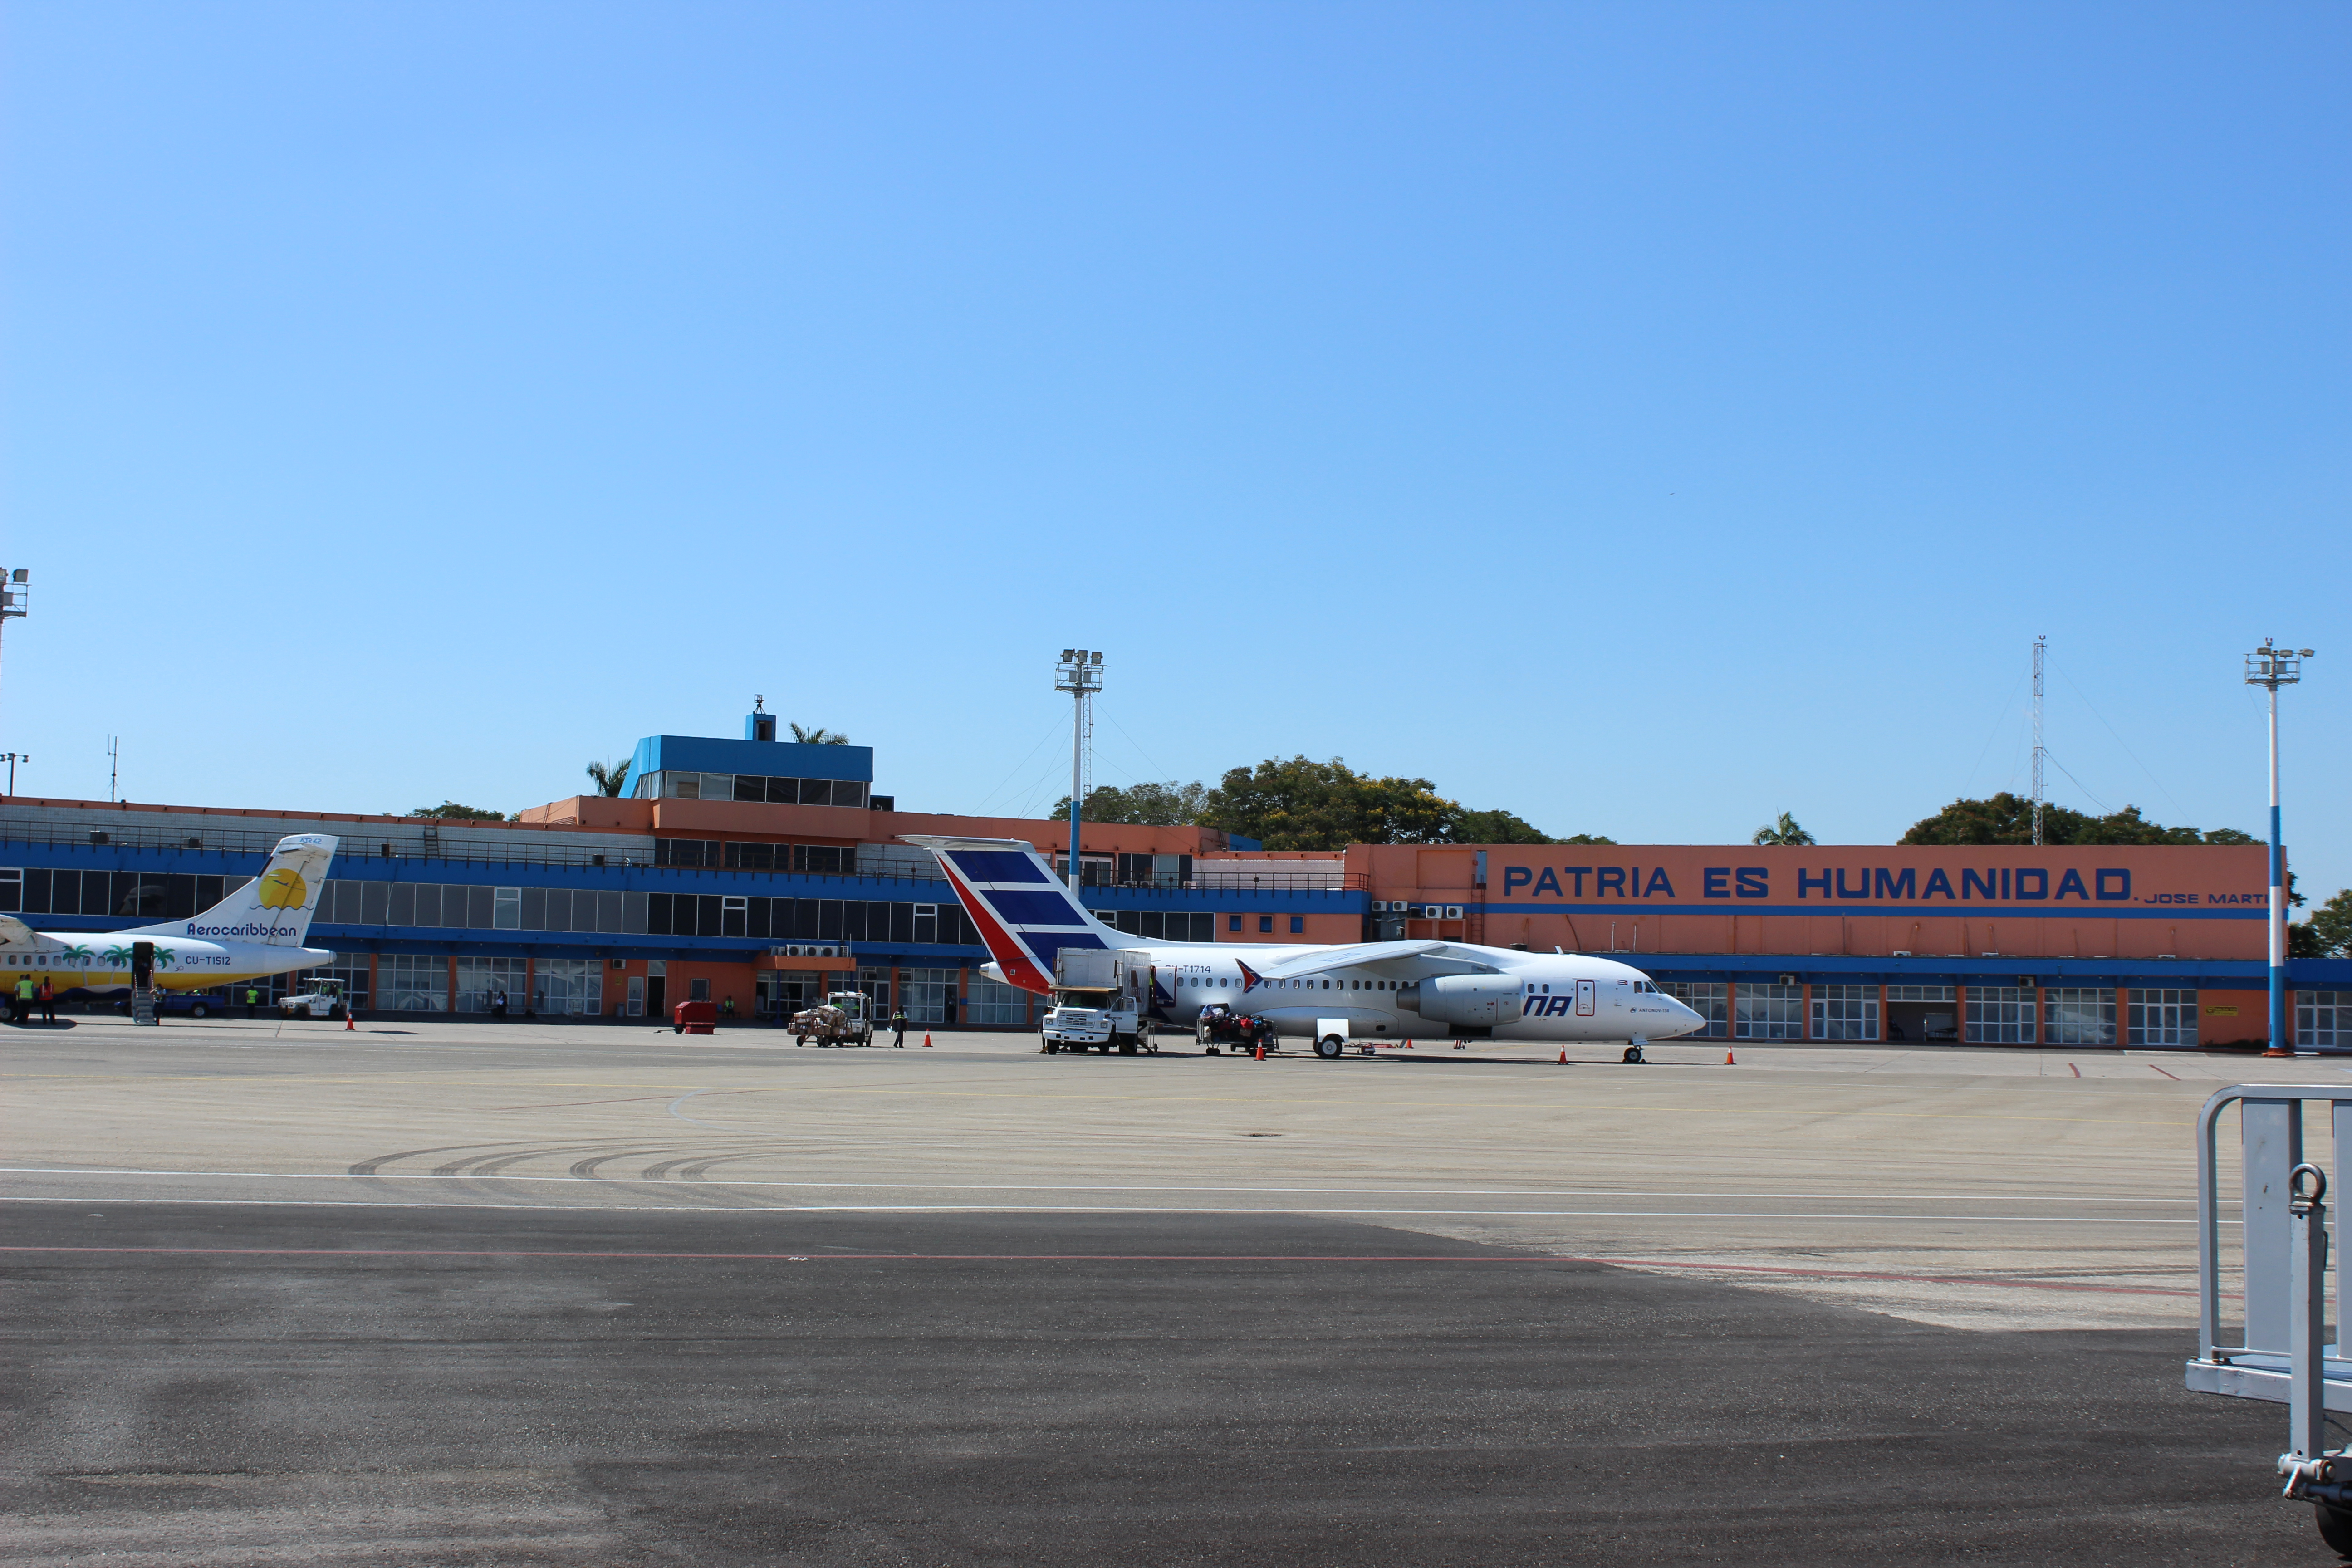 José Martí International Airport in Havana, Cuba